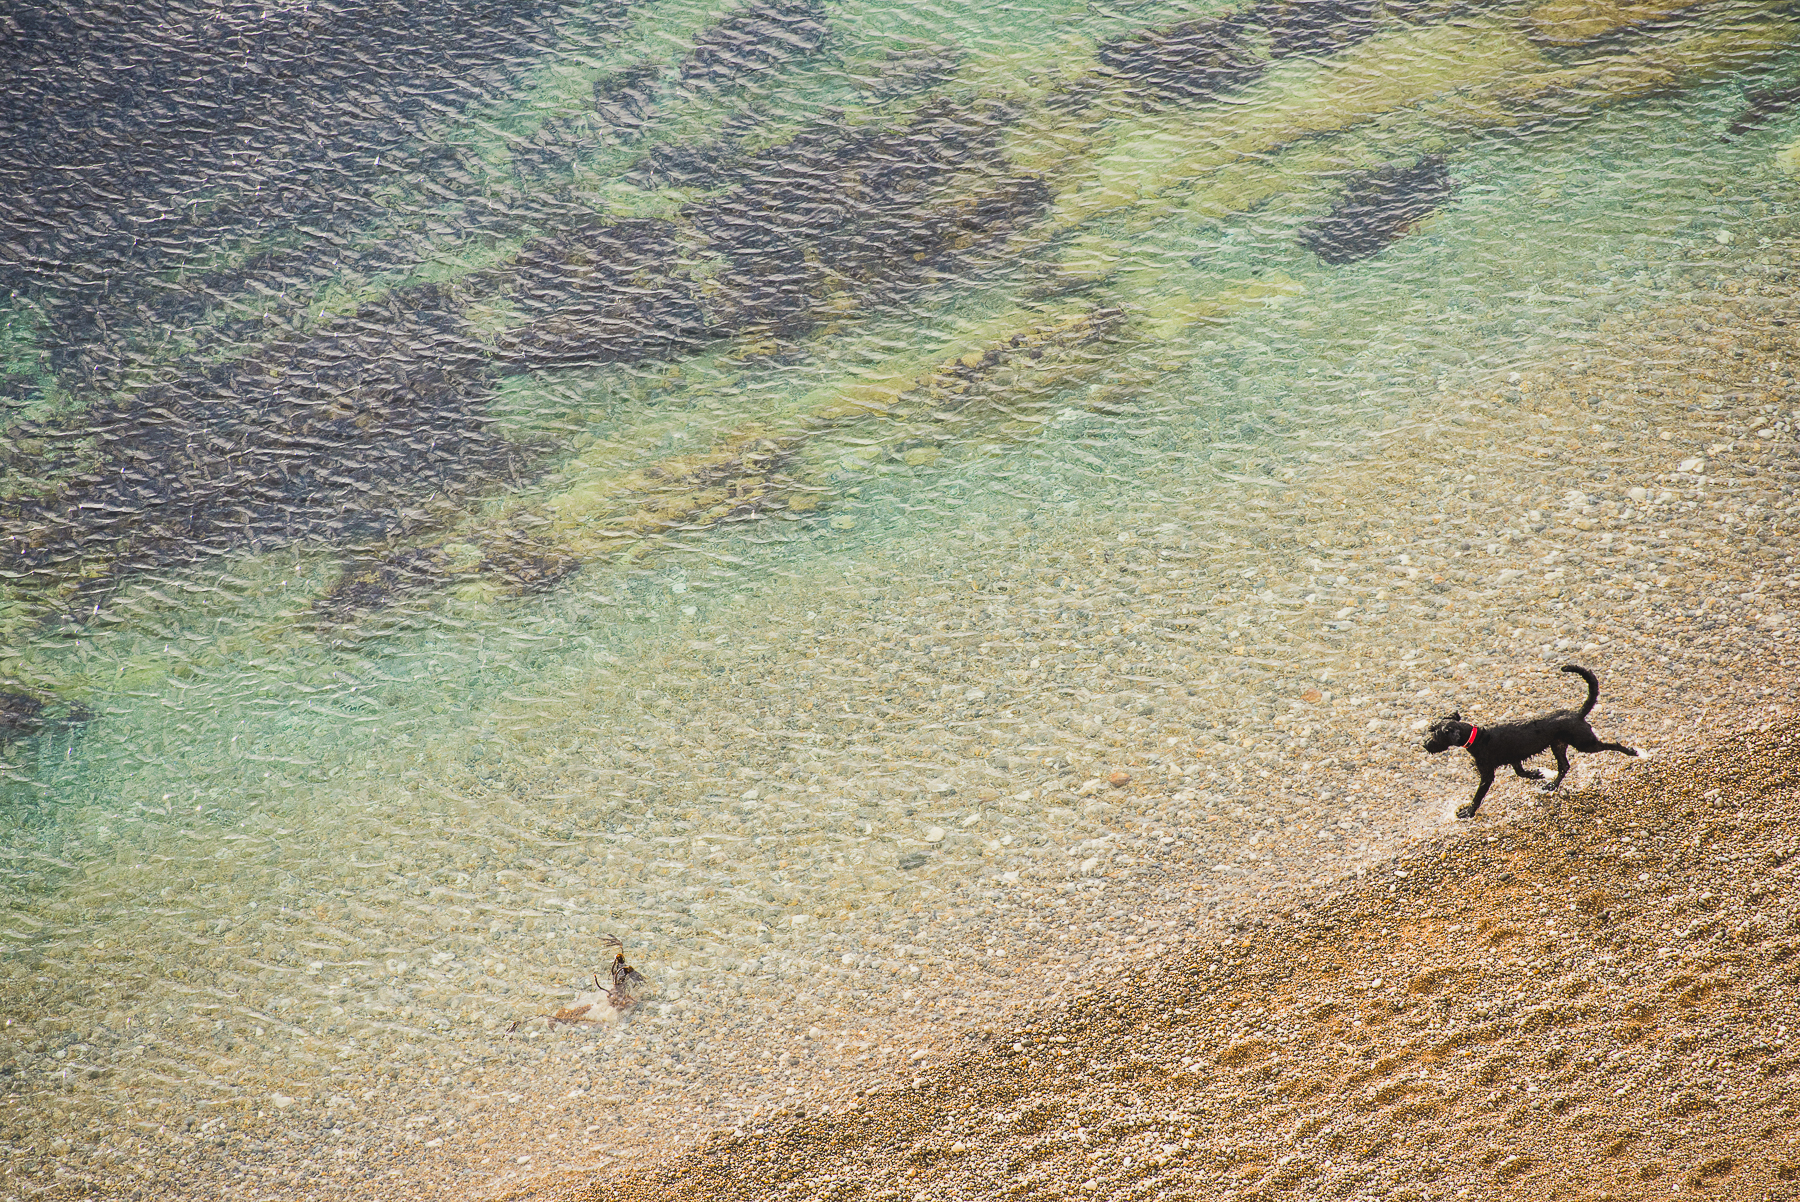 Dog walking through the shallows